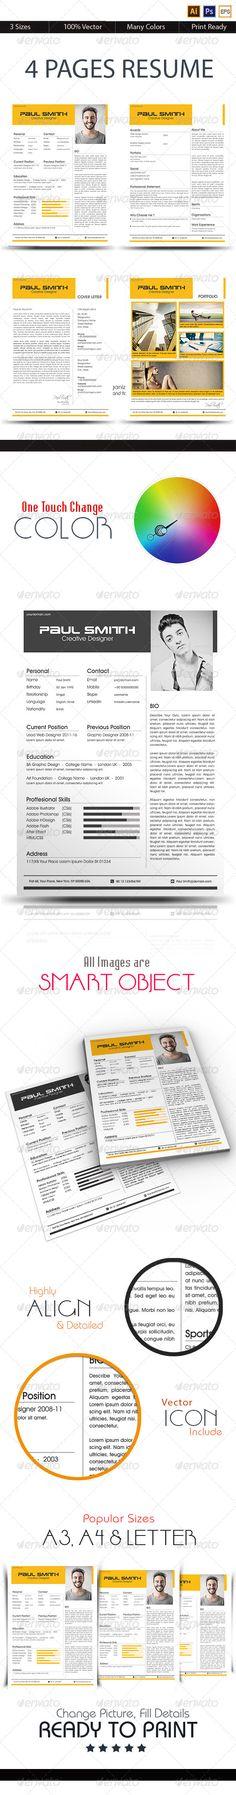 Resume / CV Resume cv, Cv template and Professional resume